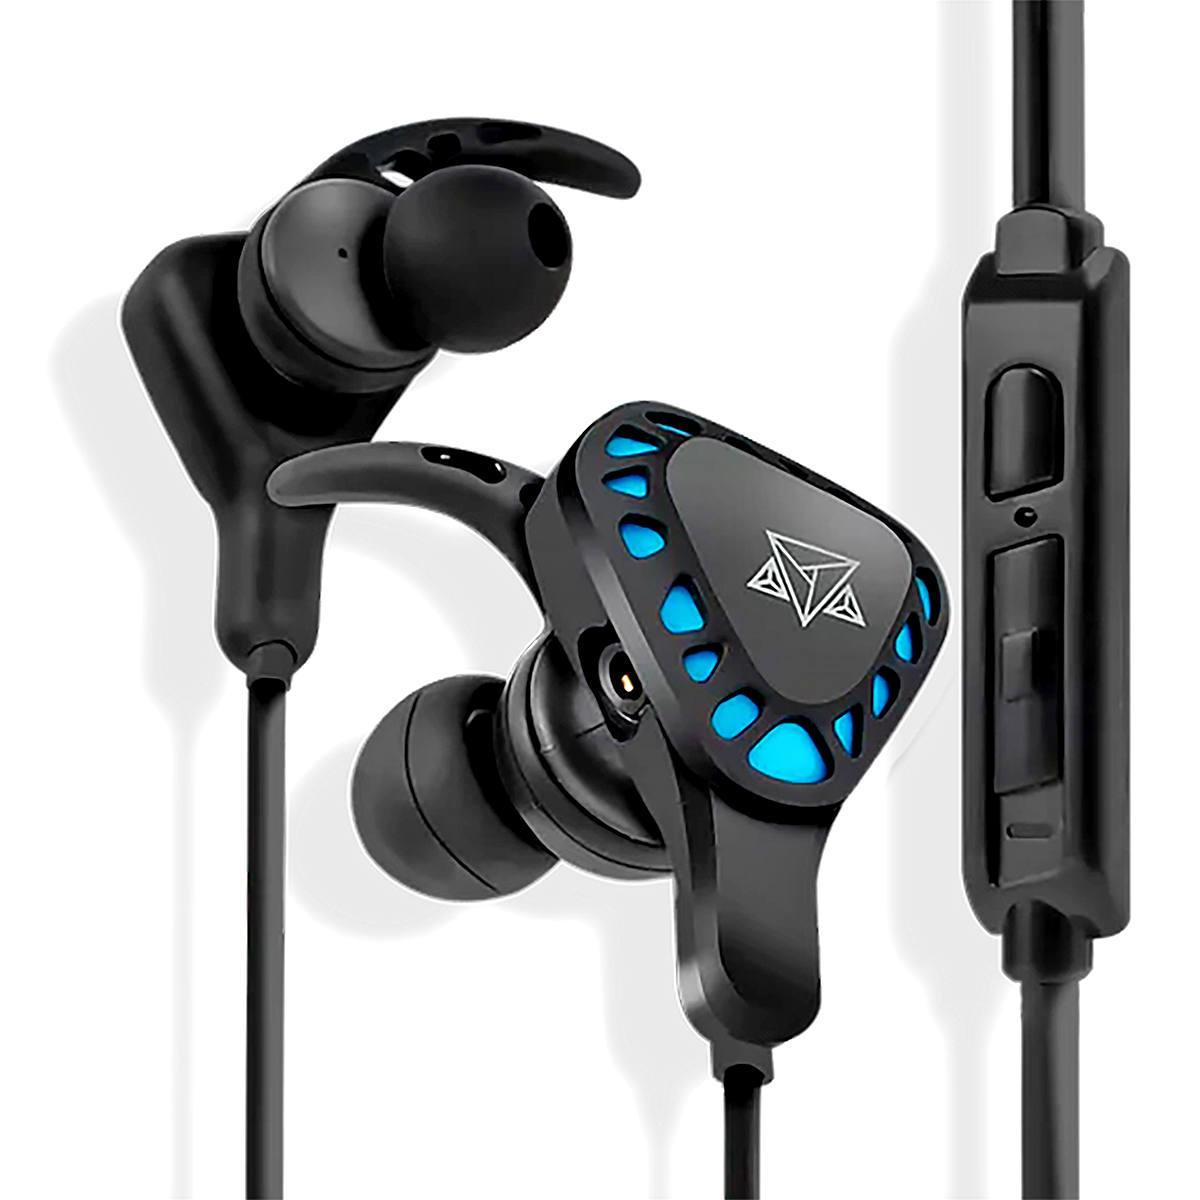 Fone com Microfone Omnidirecional Removível + Adaptador Headset In-ear Anatômicos Estéreo Adamantiun Yari AF-1001